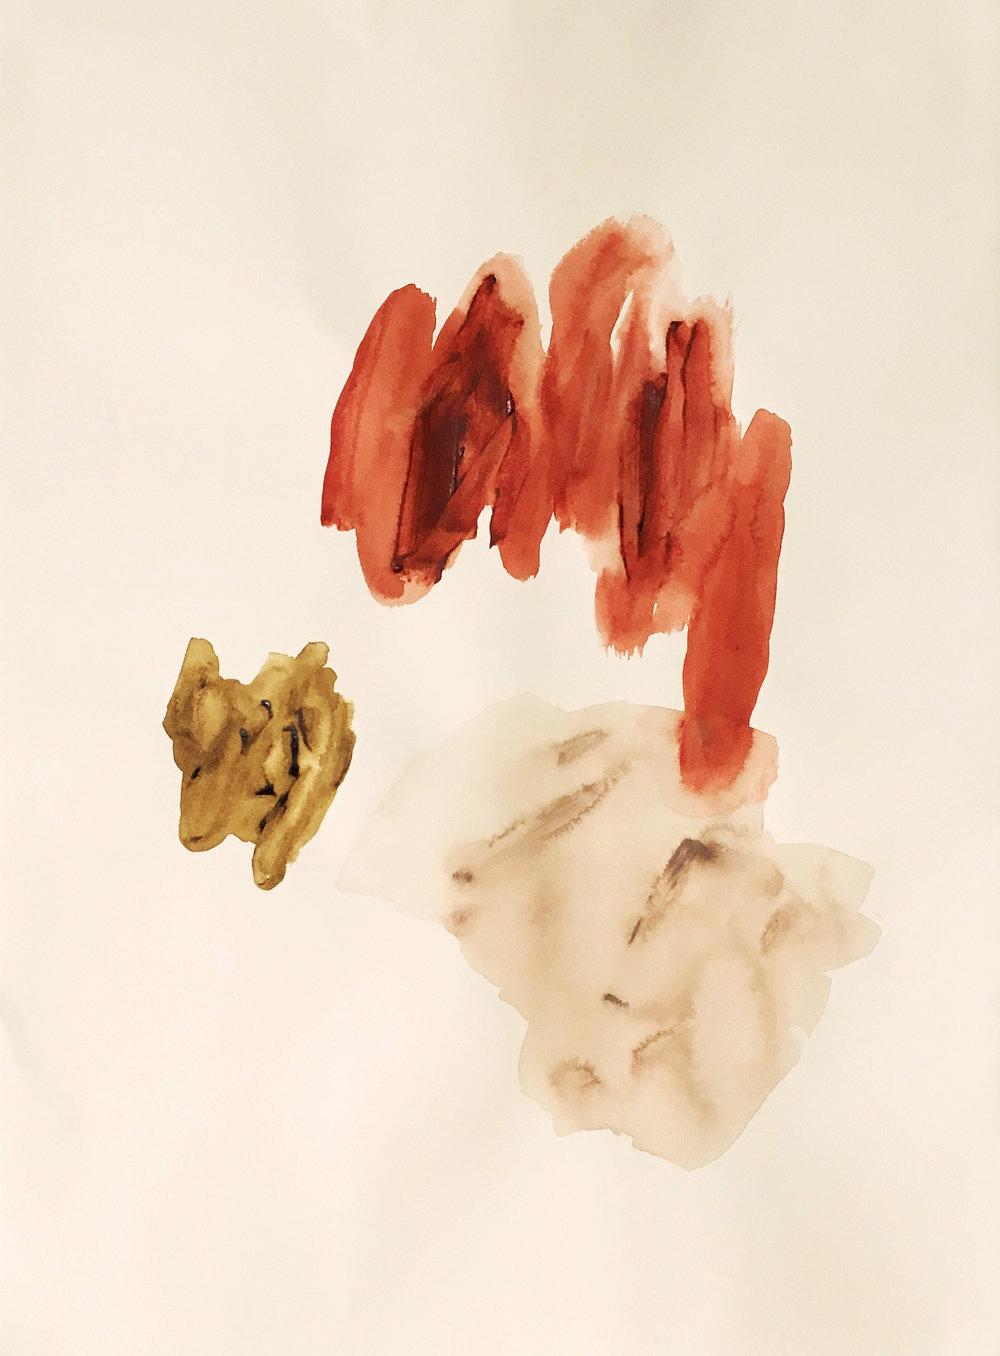 "Fields II ,acrylic on BFK Rives cotton paper, 22 x 30"", 2018"